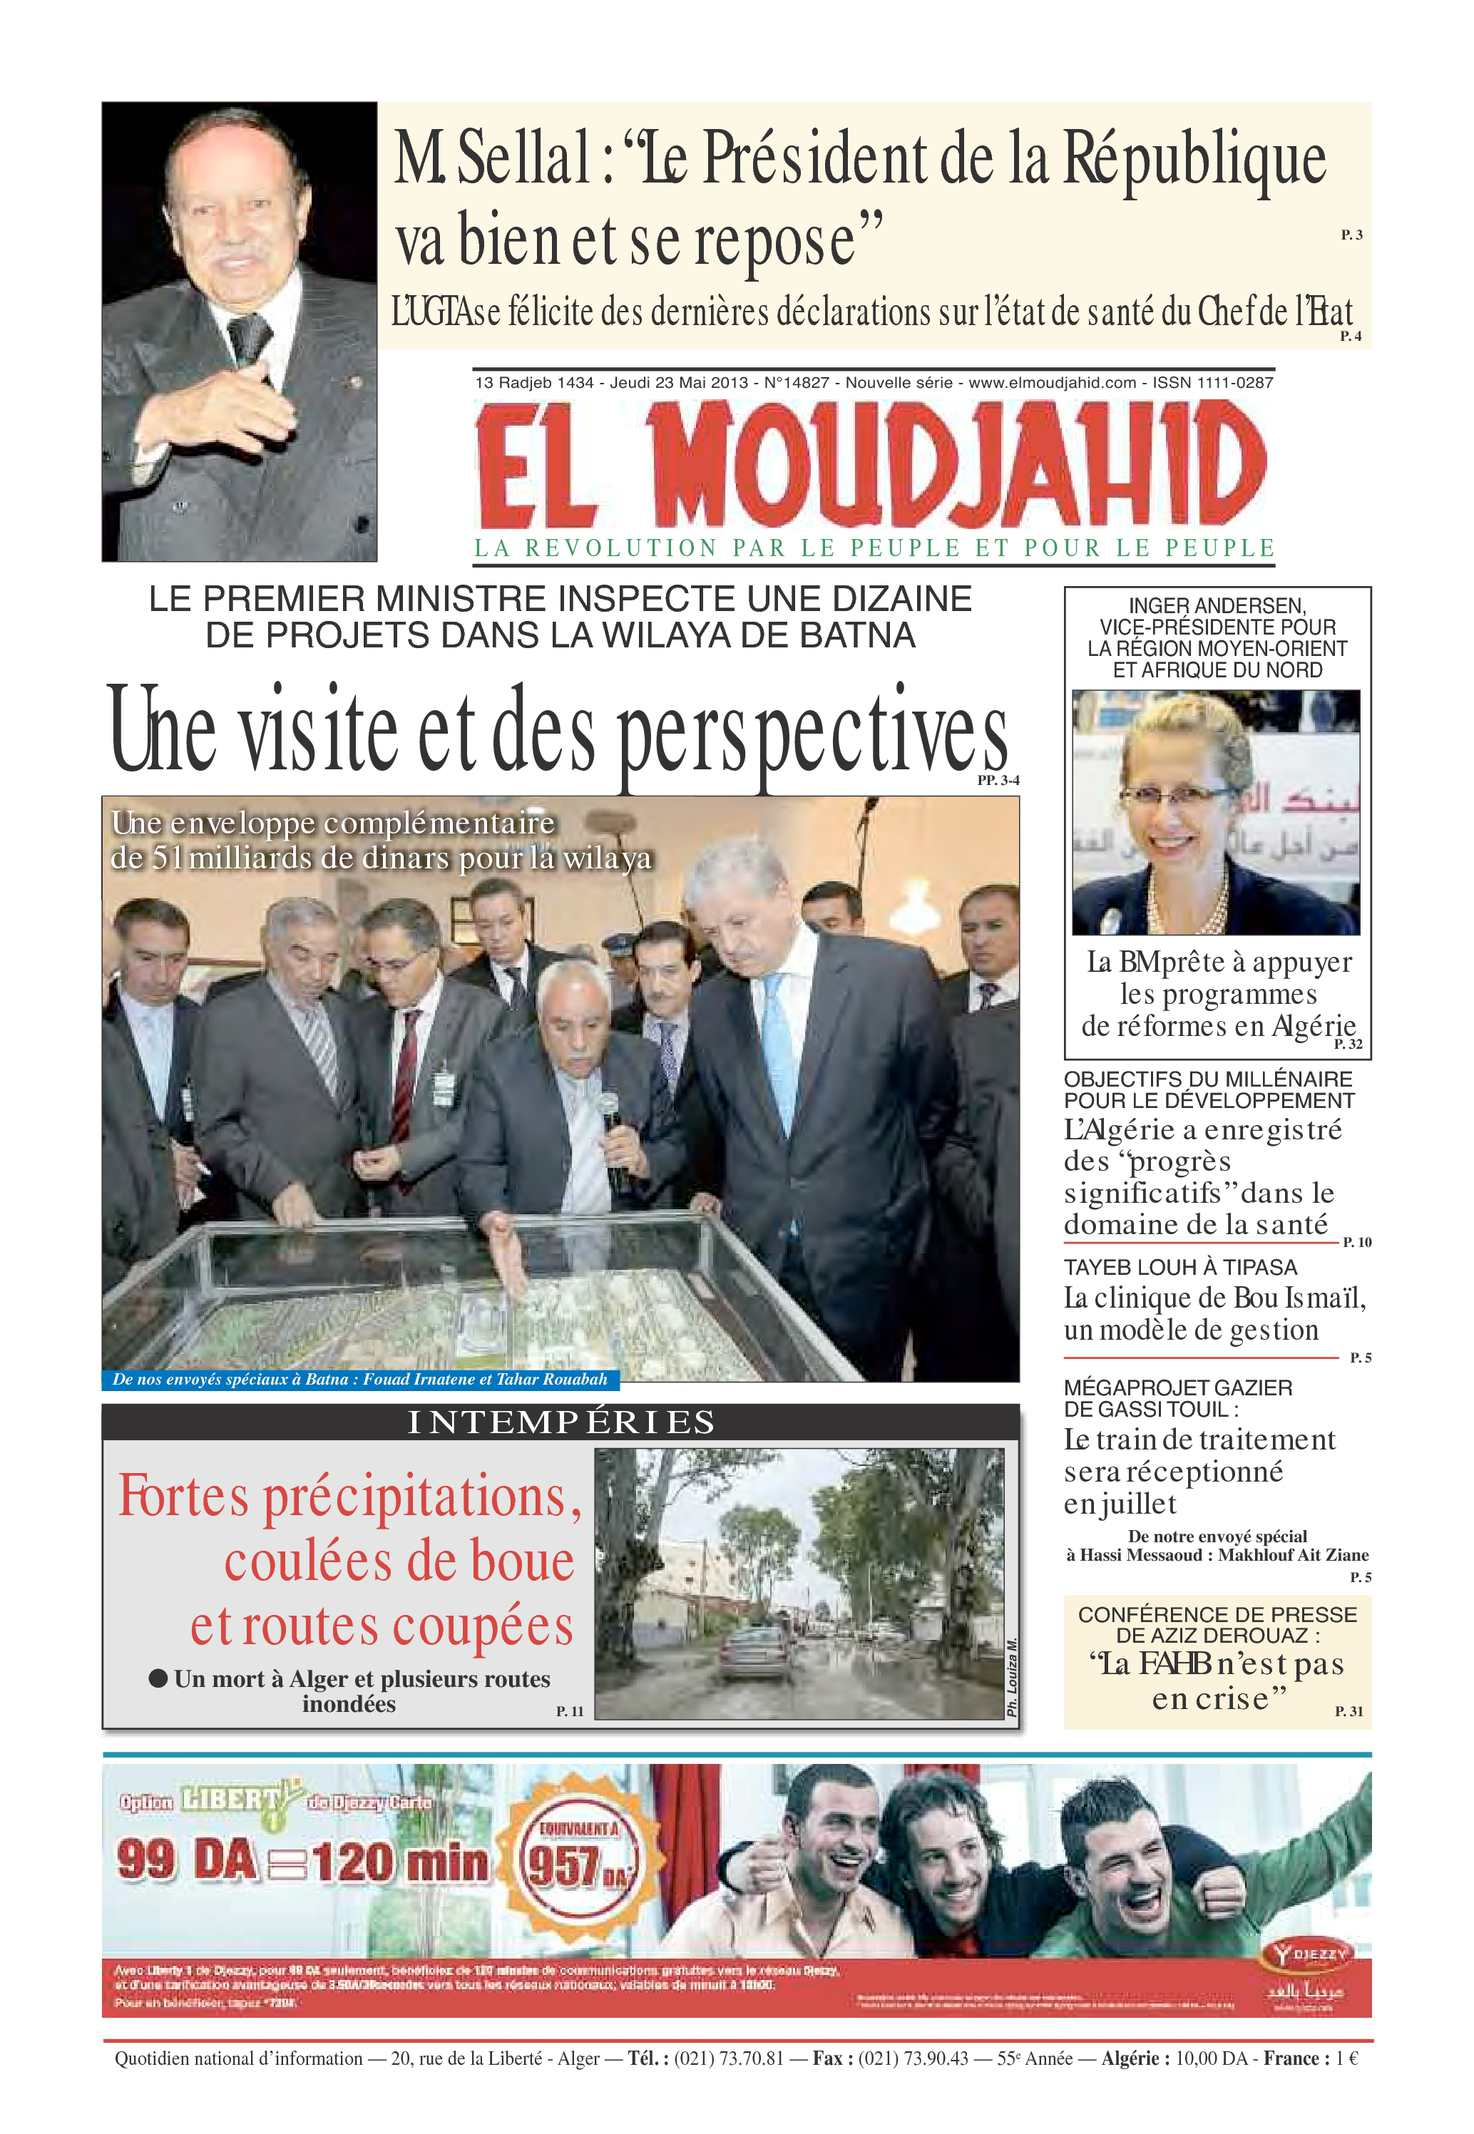 el-moudjahid